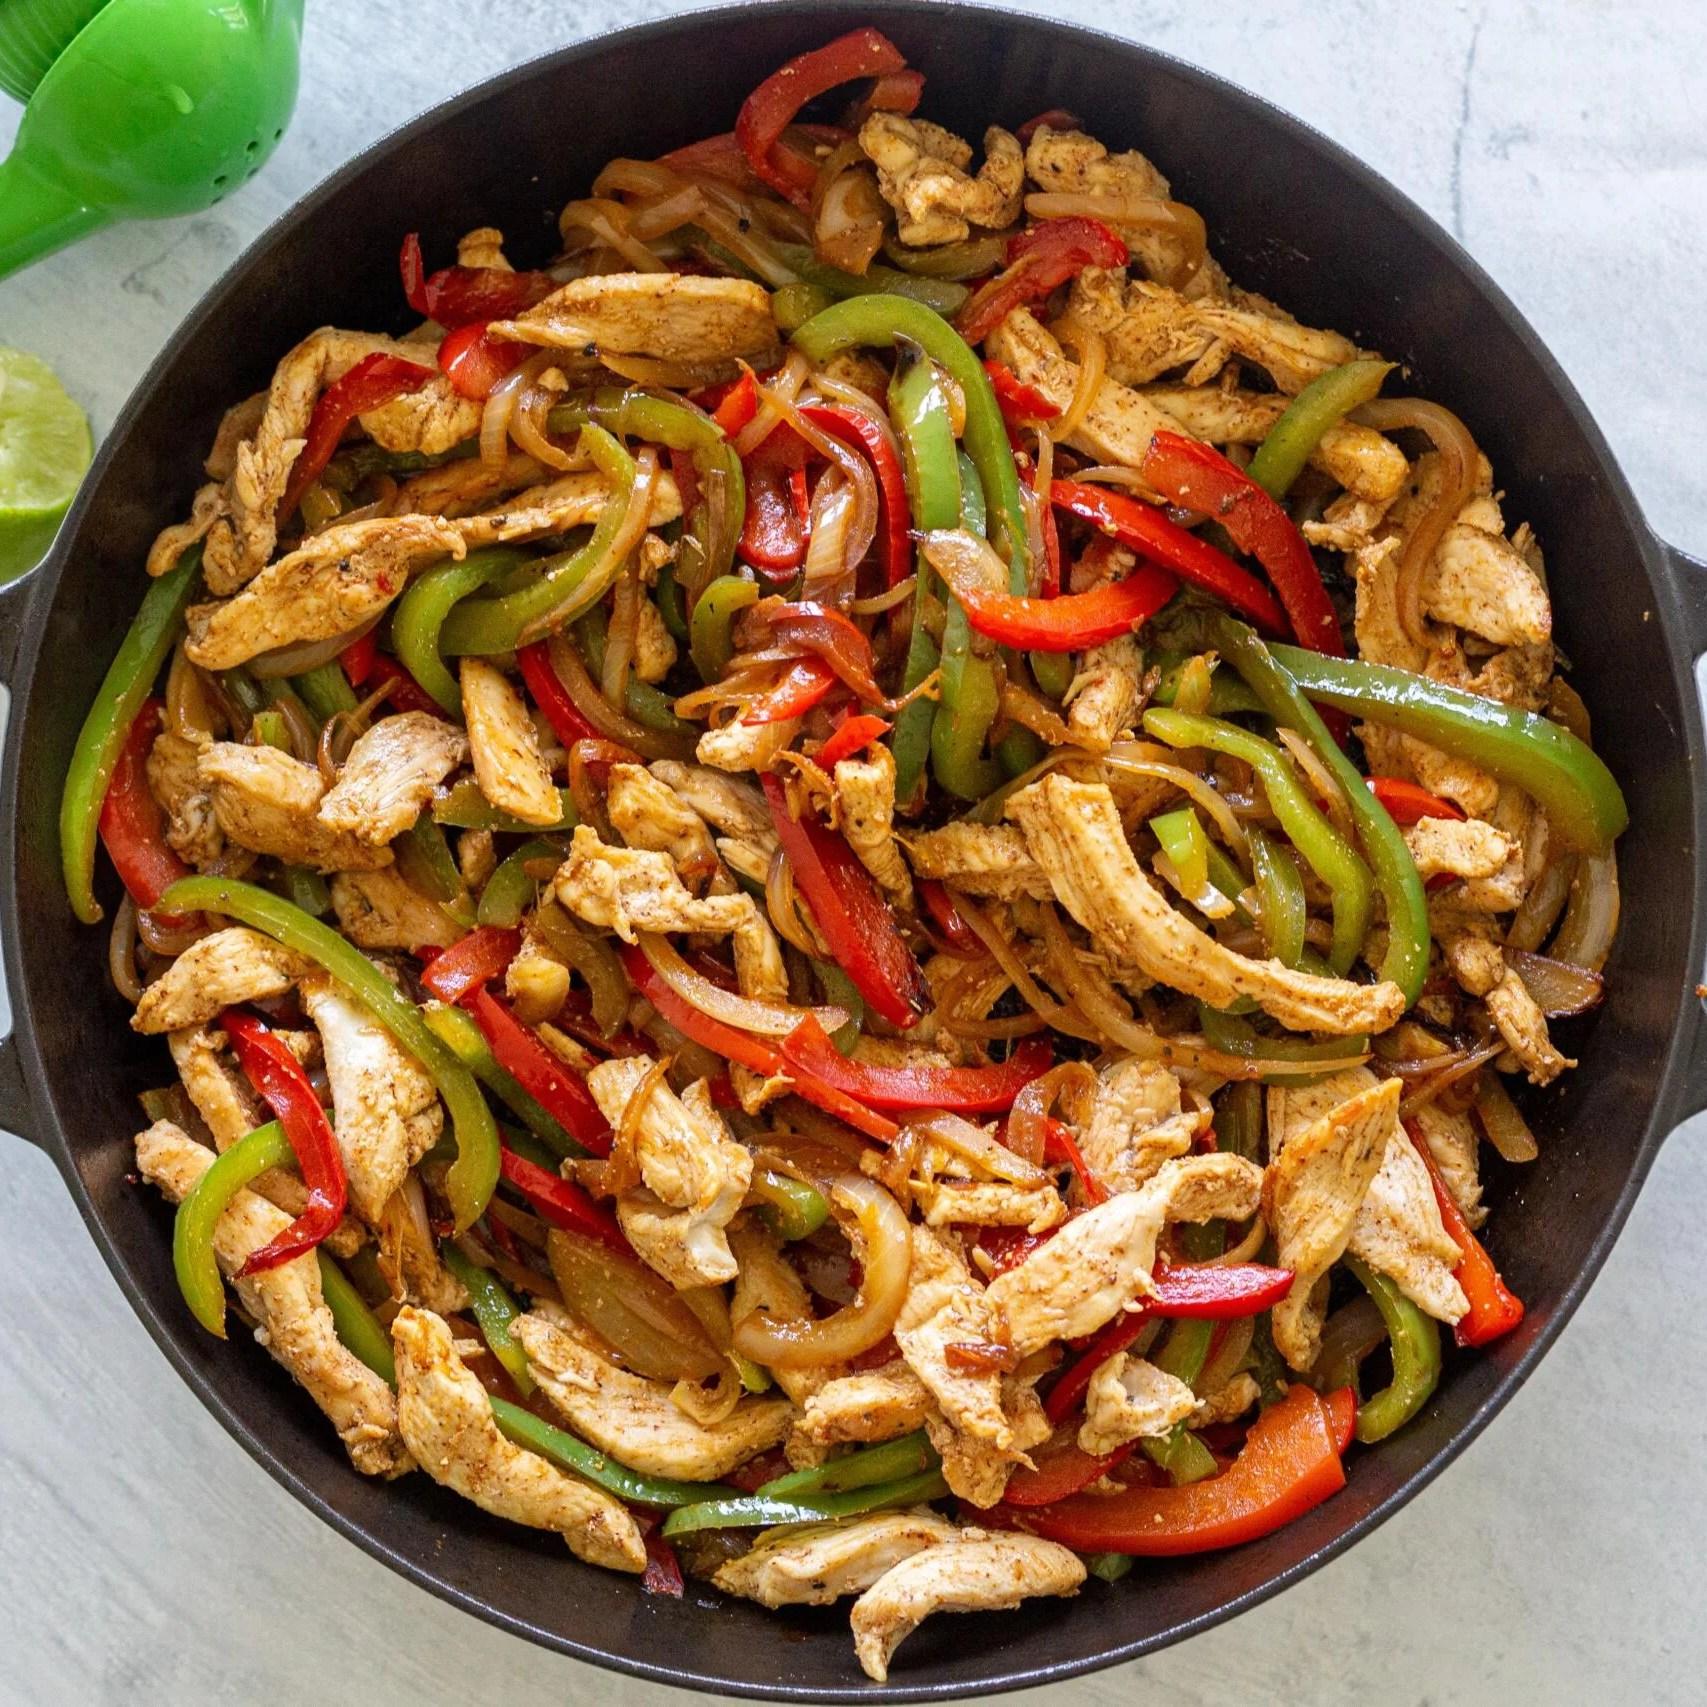 Chicken Fajita in a skillet